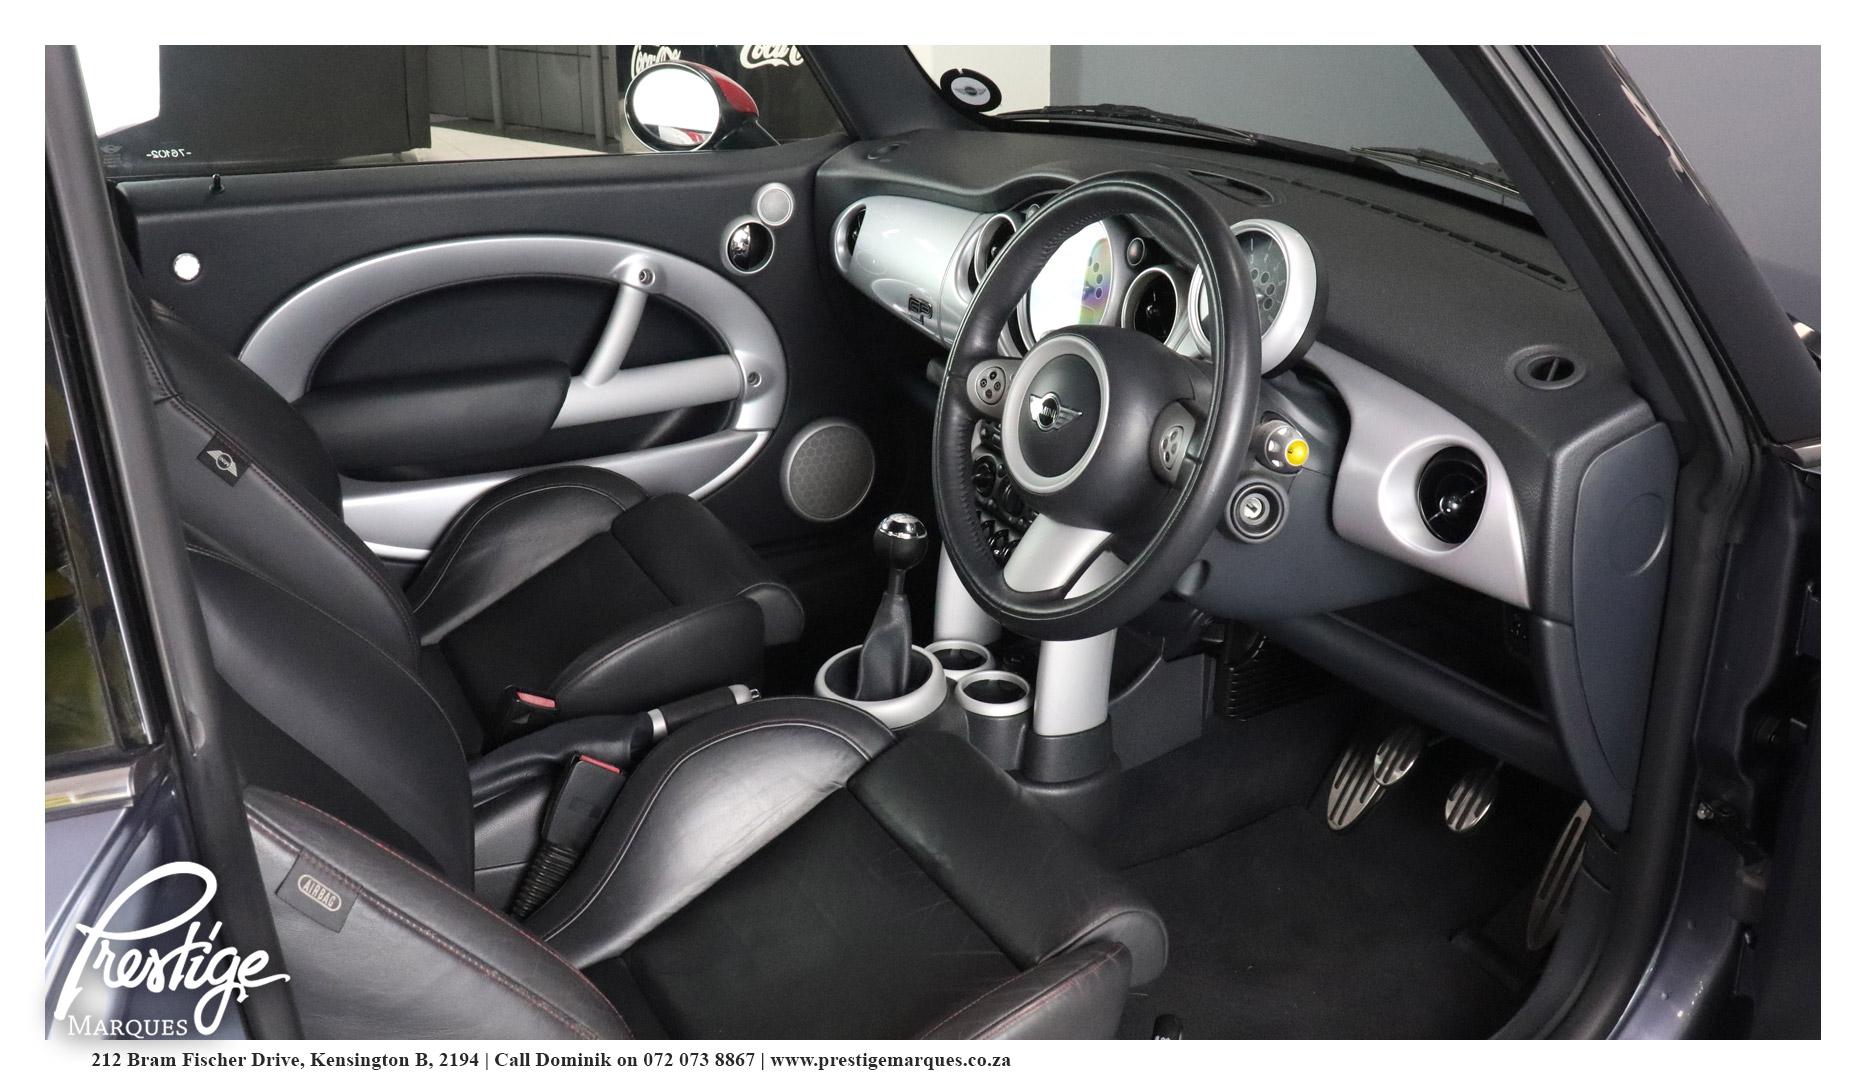 2006-Mini-Cooper-S-GP-Johon-Cooper-Works- Prestige-Marques-Randburg-Sandton-17